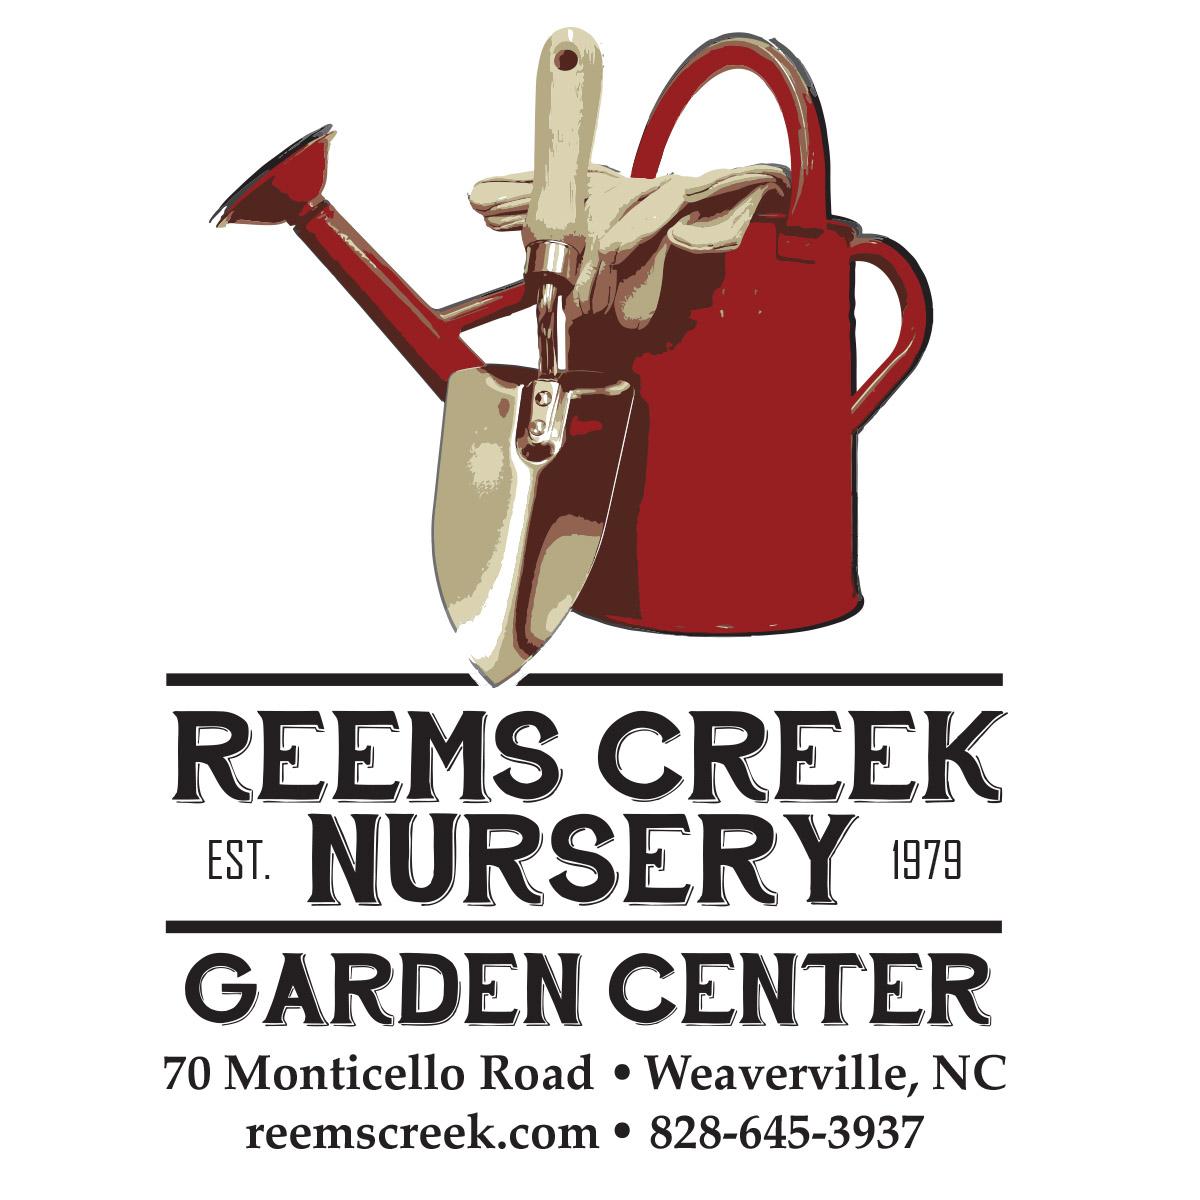 Reems Creek Nursery